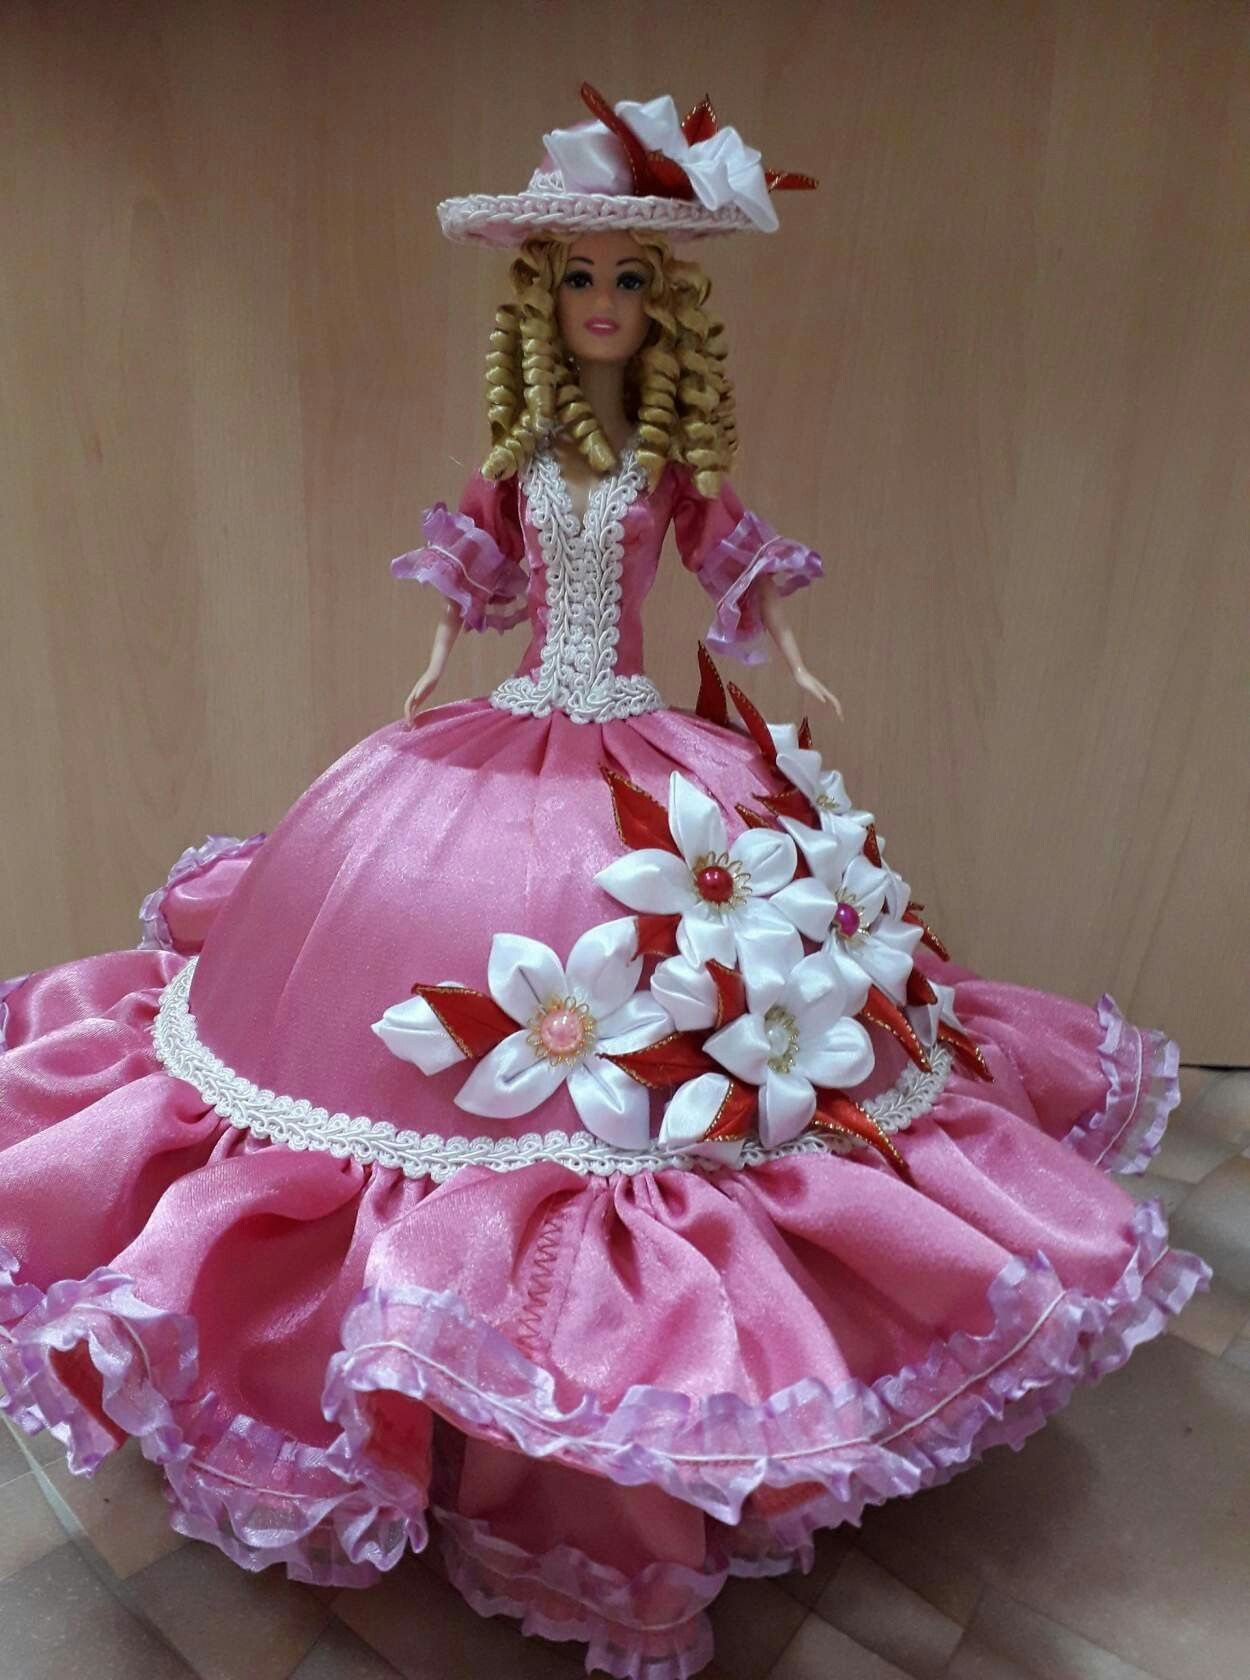 Куклы шкатулки своими руками мастер класс. кукла шкатулка из куклы барби. платье для куклы шкатулки. как сделать куклу шкатулку своими руками